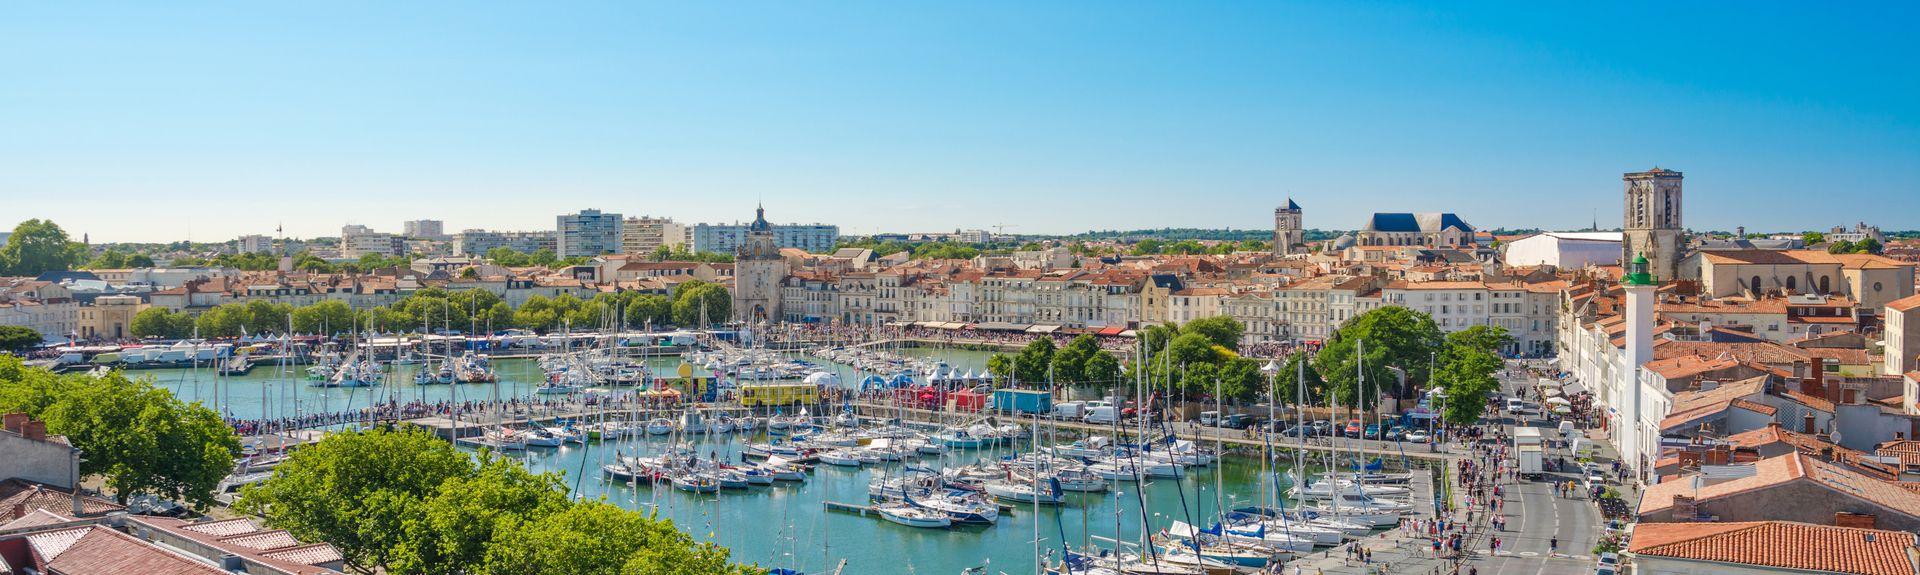 Main image ofWeek-end at La Rochelle